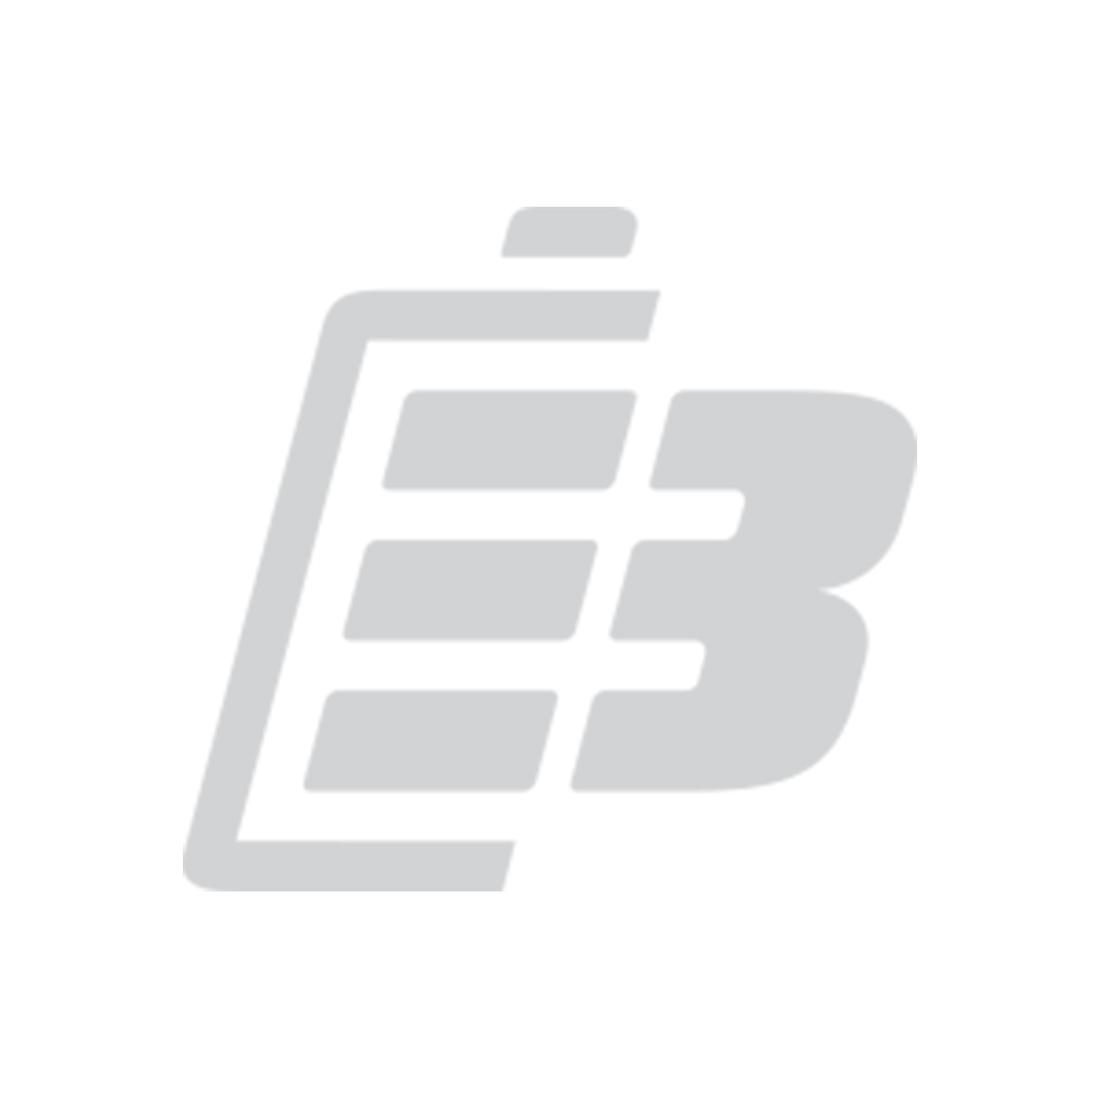 Cordless phone battery Grundig Frame A_1